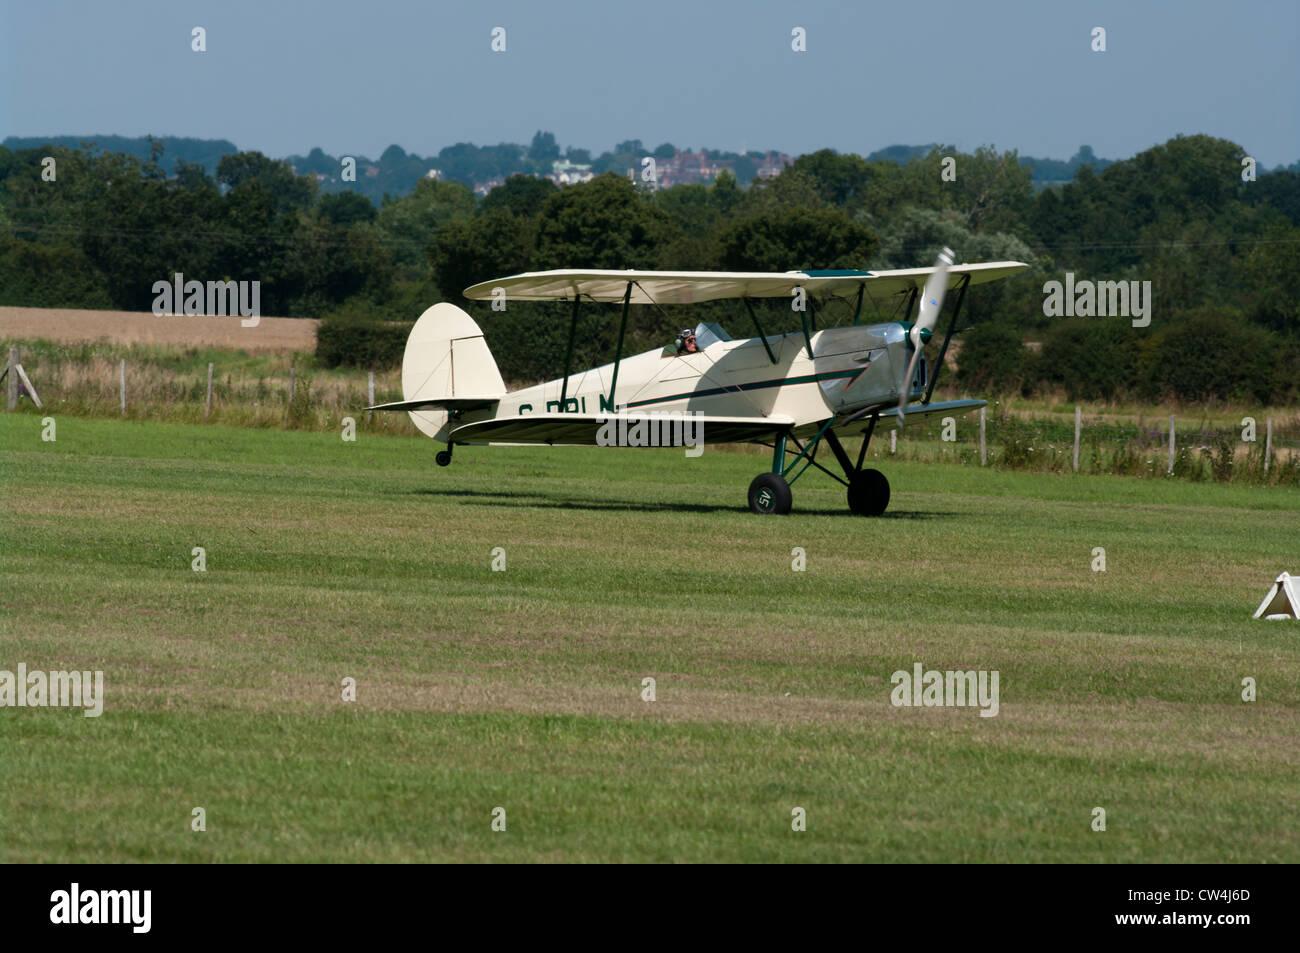 The Stampe Biplane Bi Plane UK - Stock Image